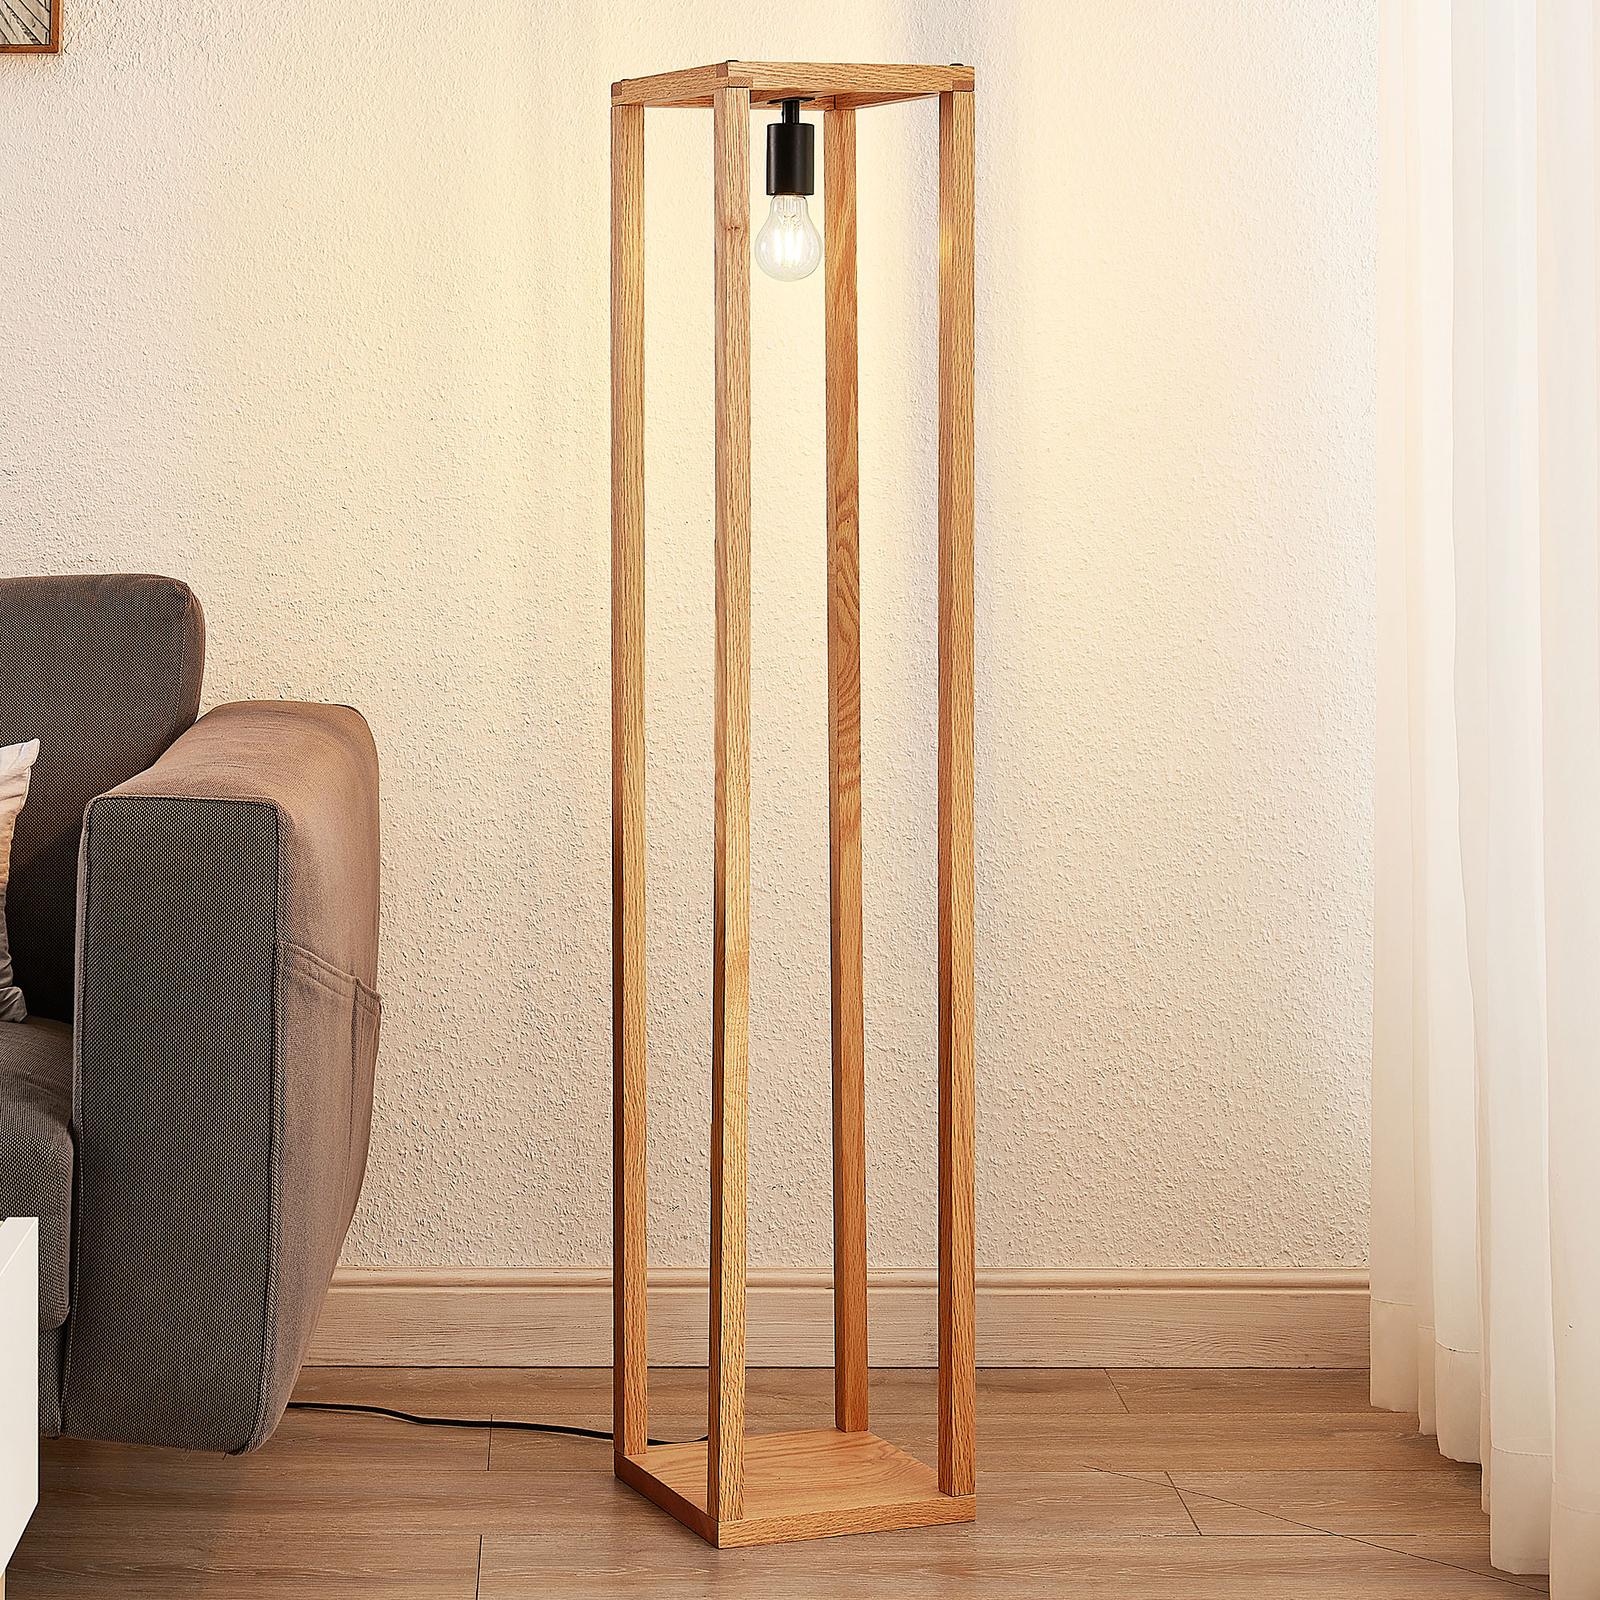 Lucande Sedrik vloerlamp in doosvorm